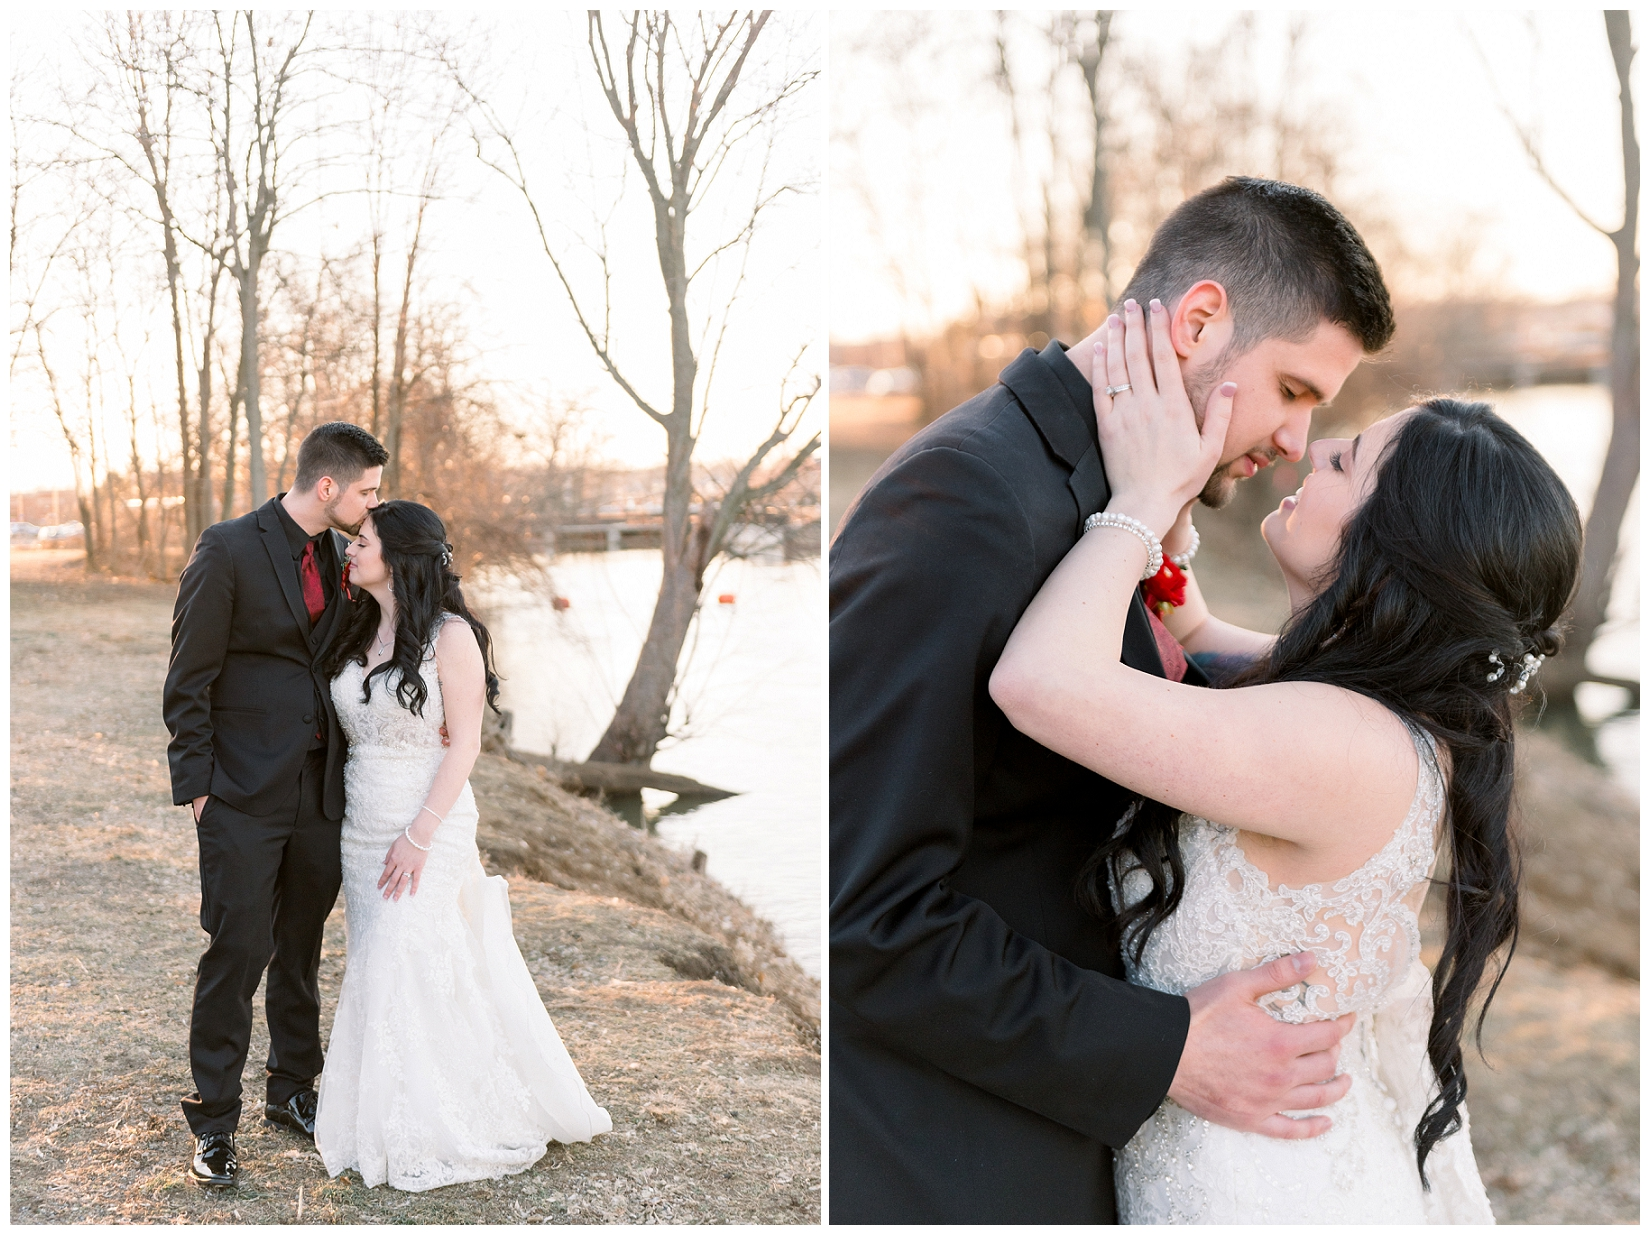 cat-alkire-wedding-photographer-indiana-chicago-indianapolis-fort-wayne_1132.jpg